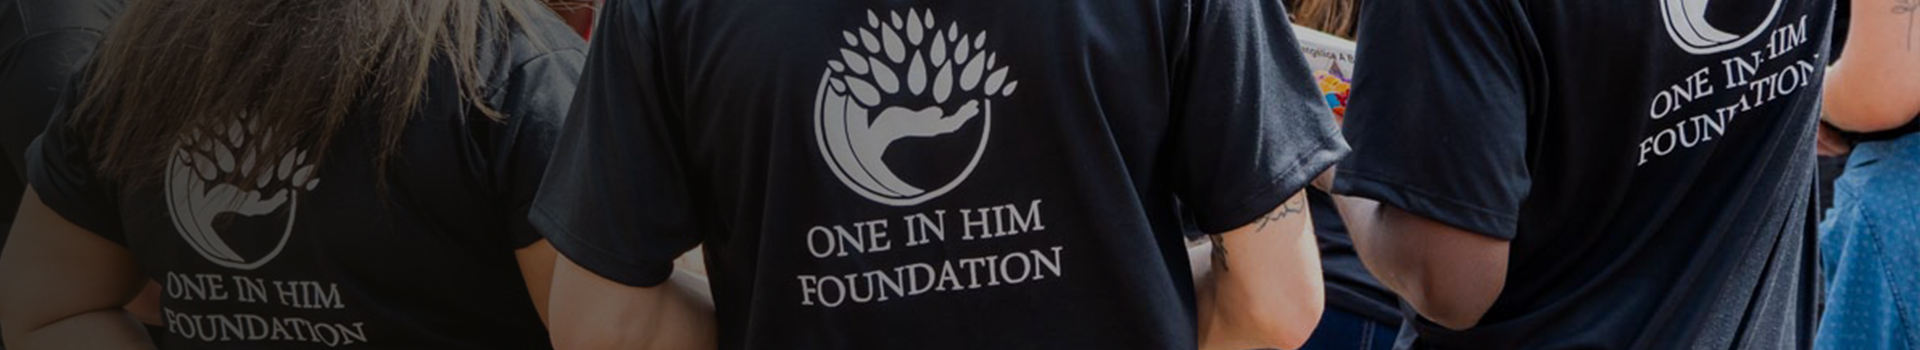 Het One In Him Foundation Team